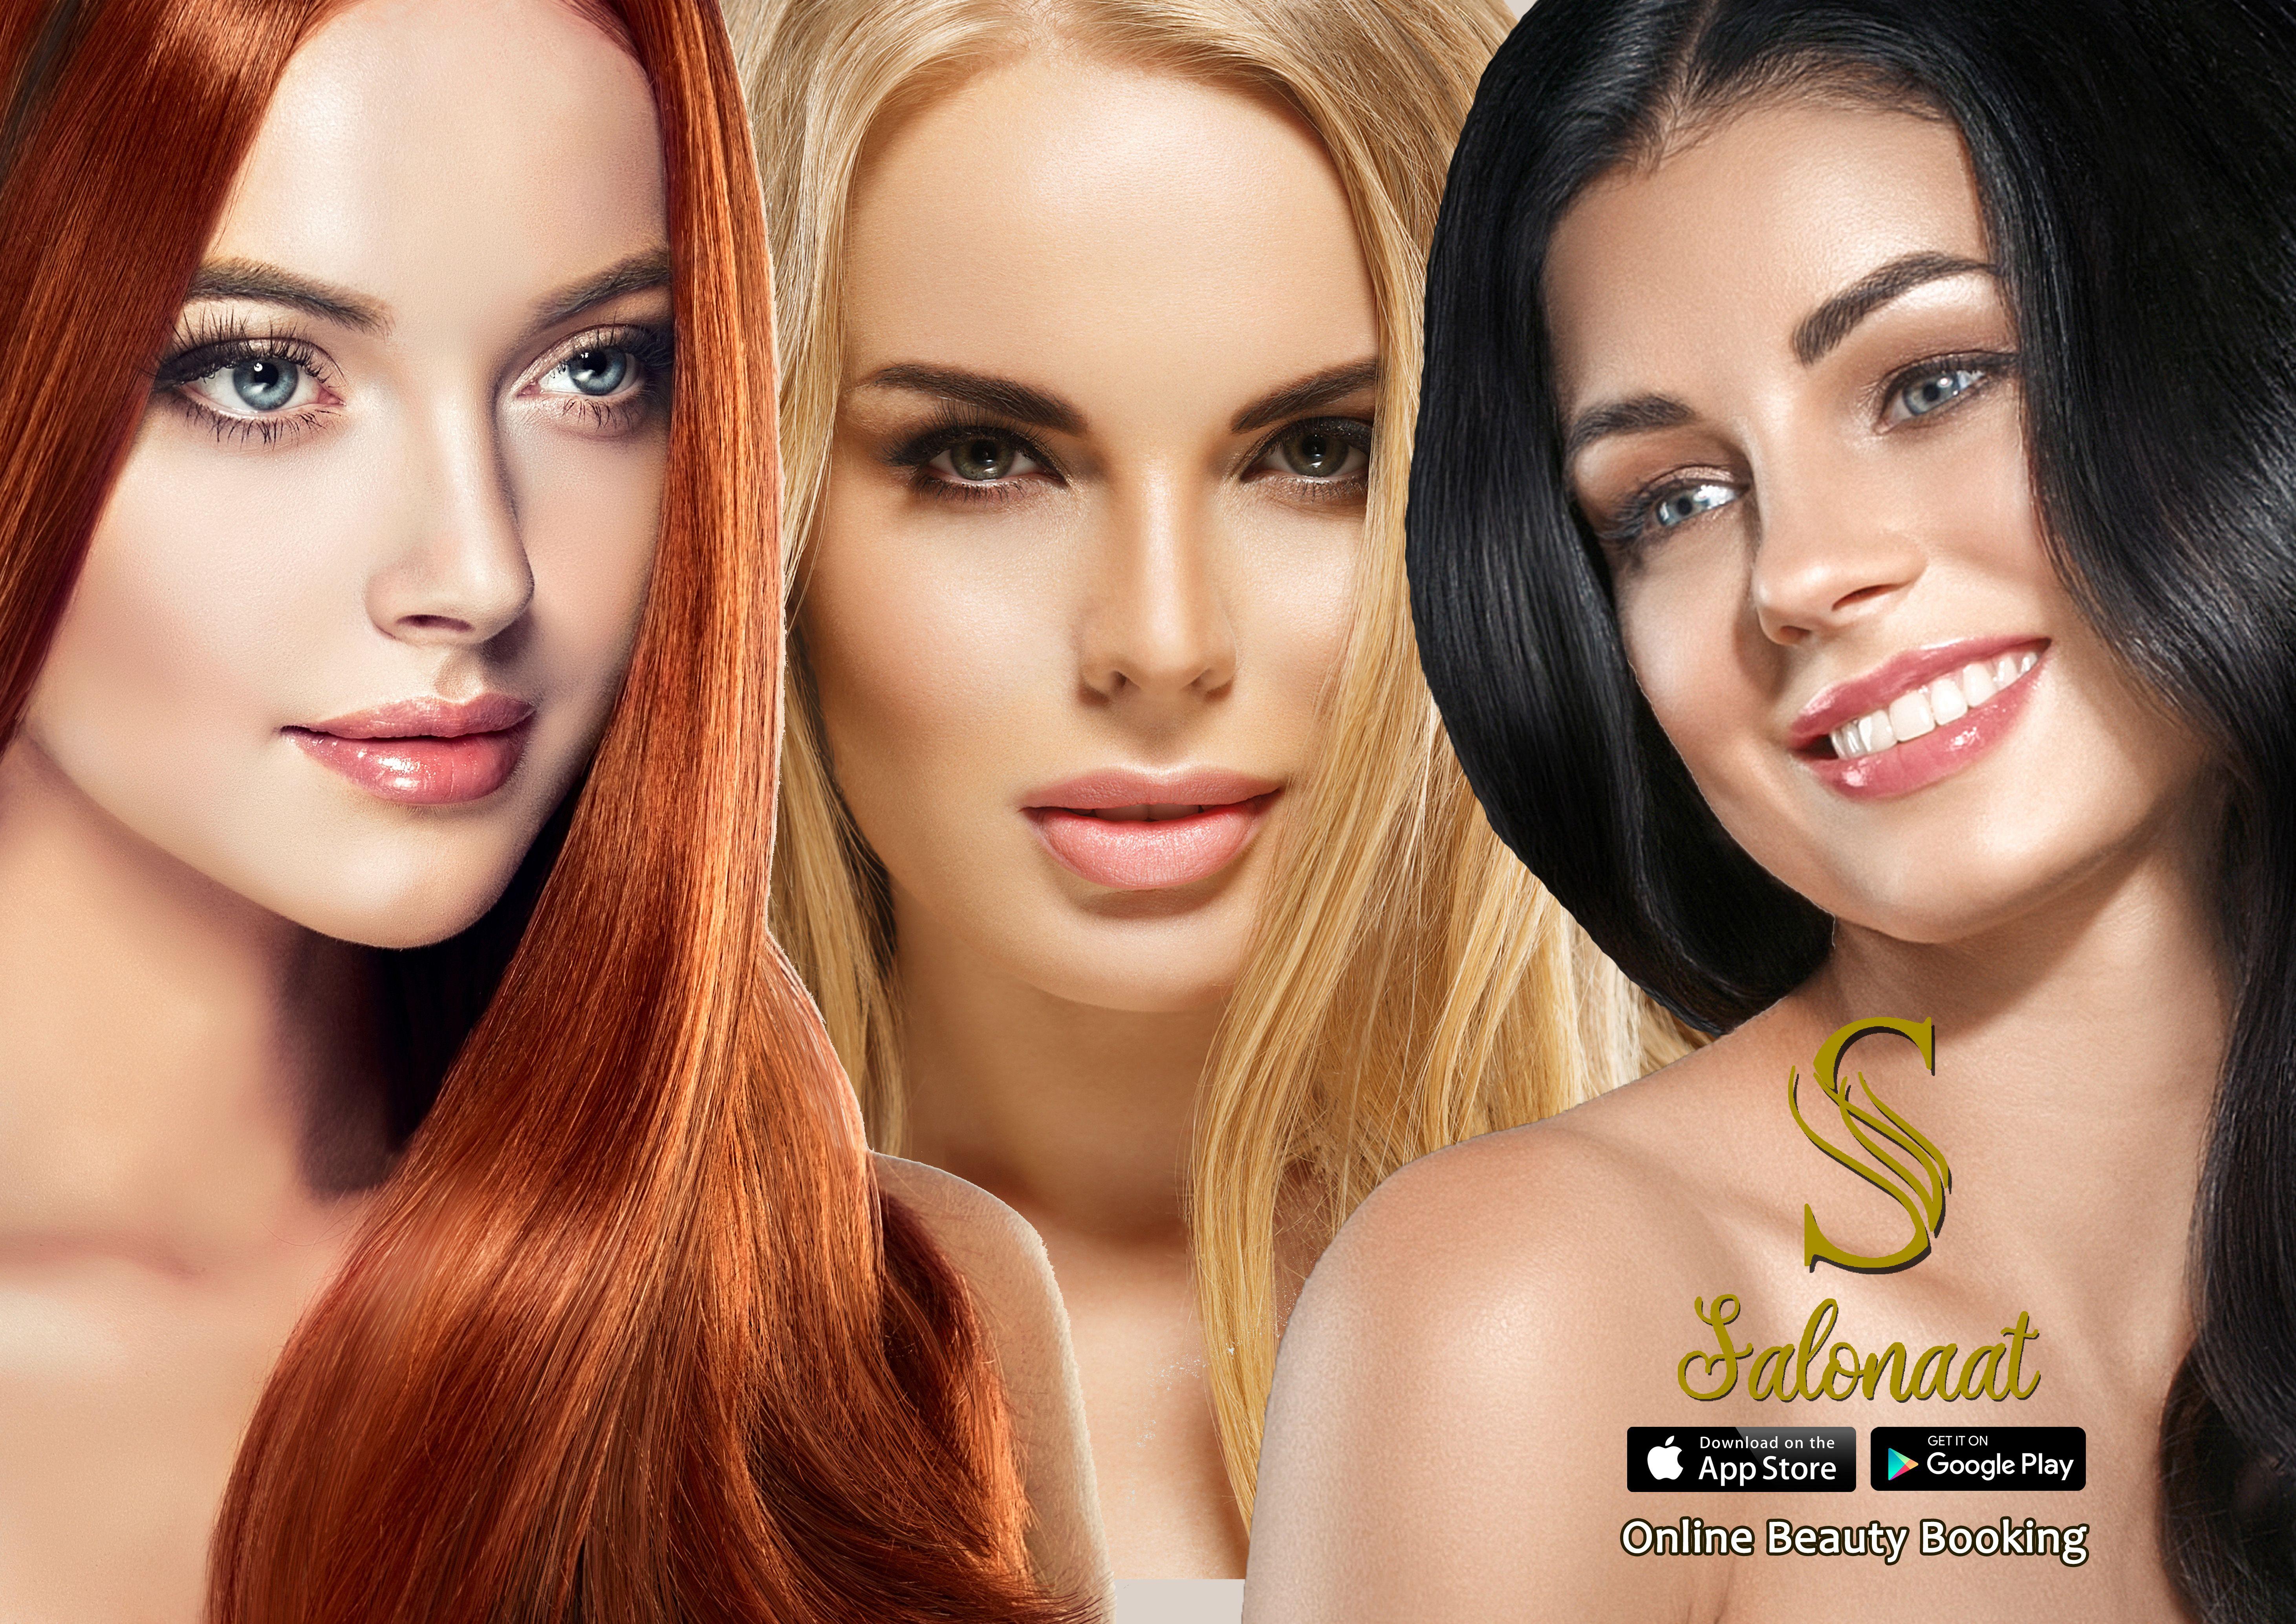 Hair Color Interesting Facts Instagram Salonaatapp Pinterest